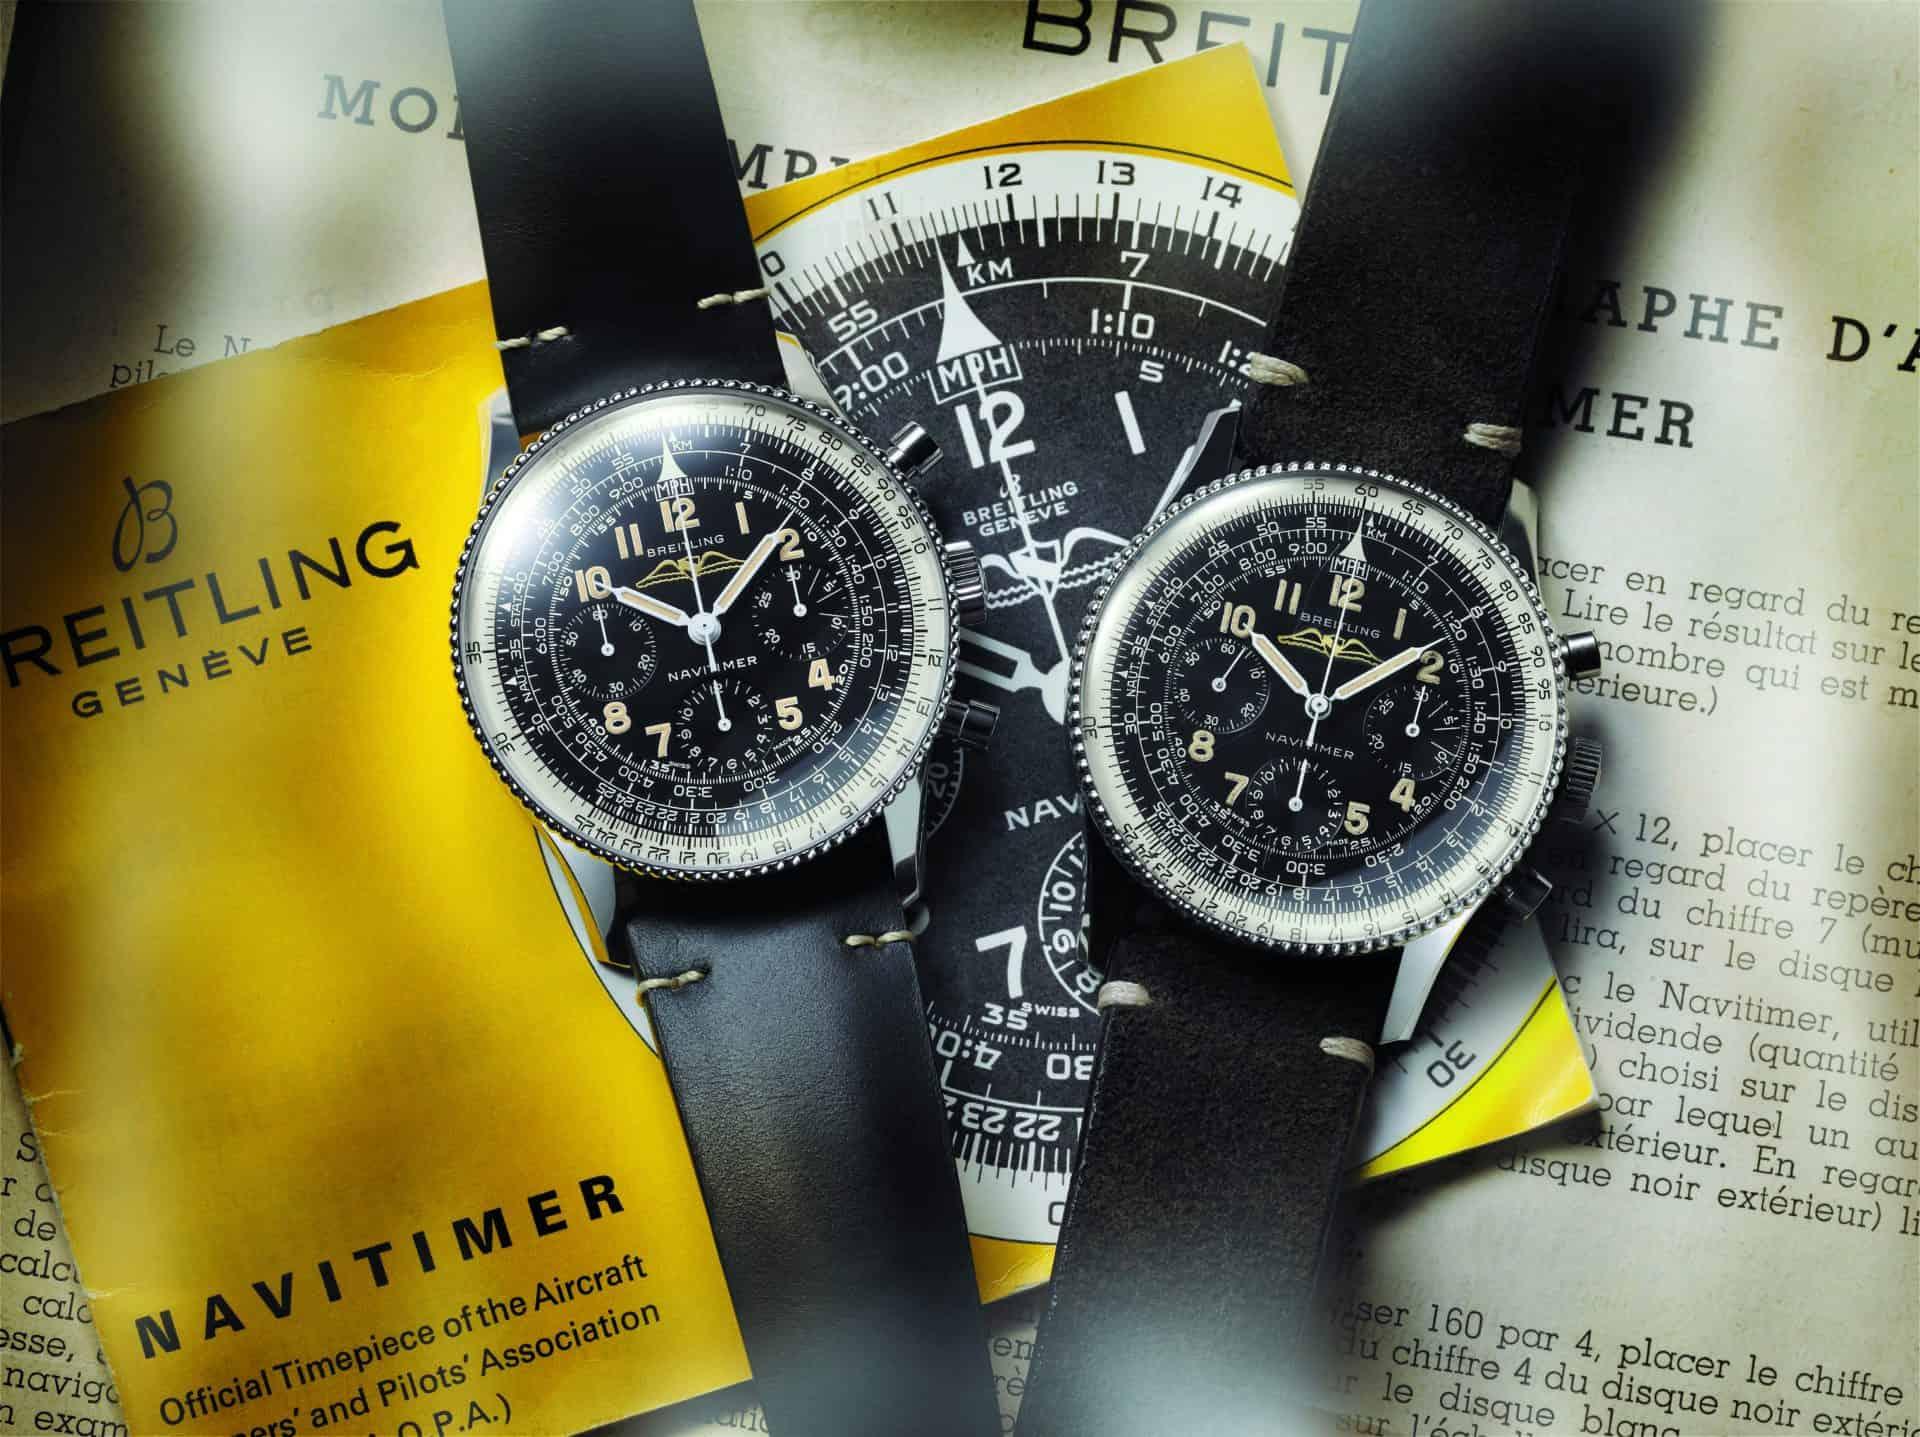 Breitling Navitimer Ref. 806 1959 Re-Edition